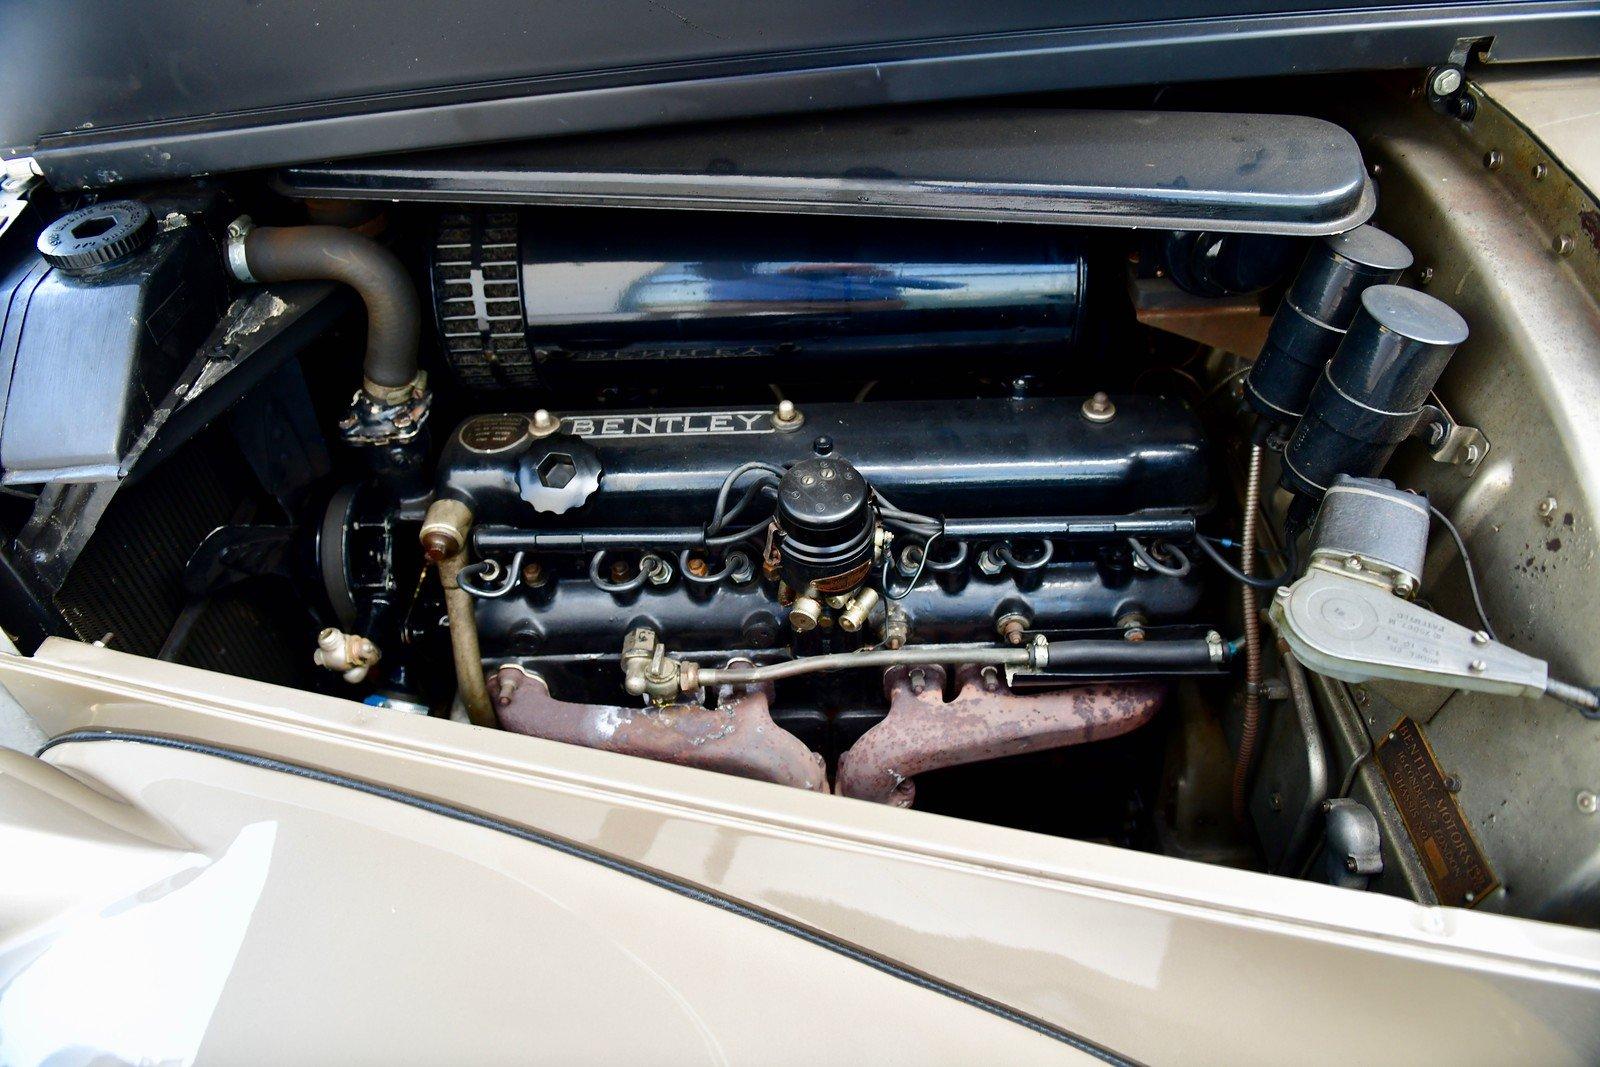 1949 Bentley Mark 6 Standard Steel Saloon For Sale (picture 6 of 6)